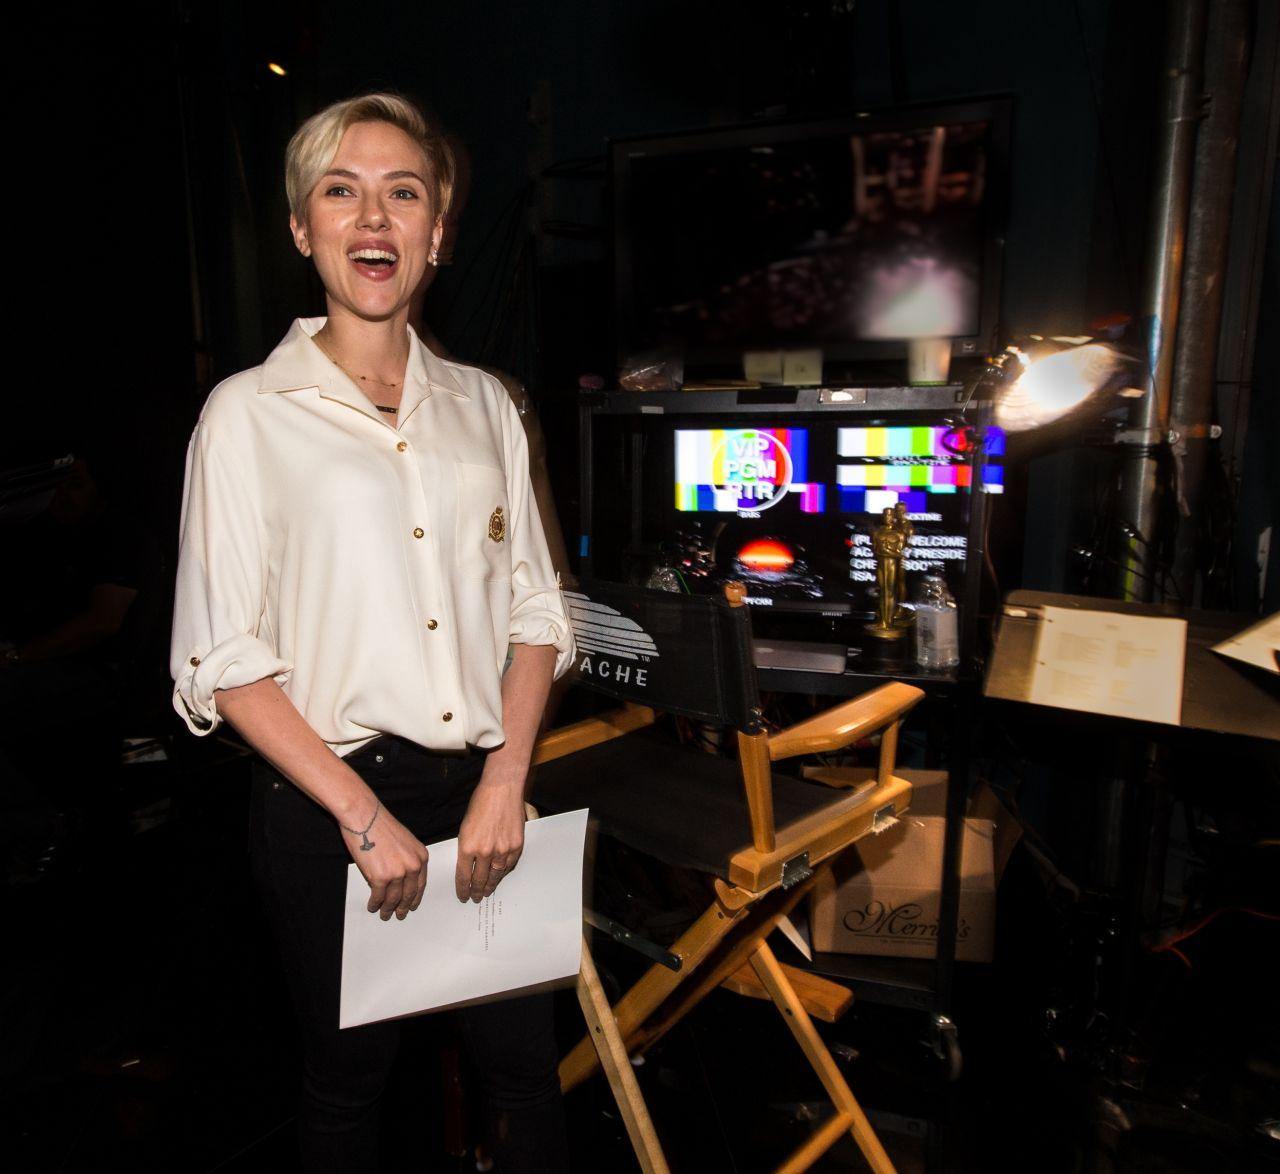 Scarlett Johansson - 2015 Academy Awards Rehearsal in Hollywood